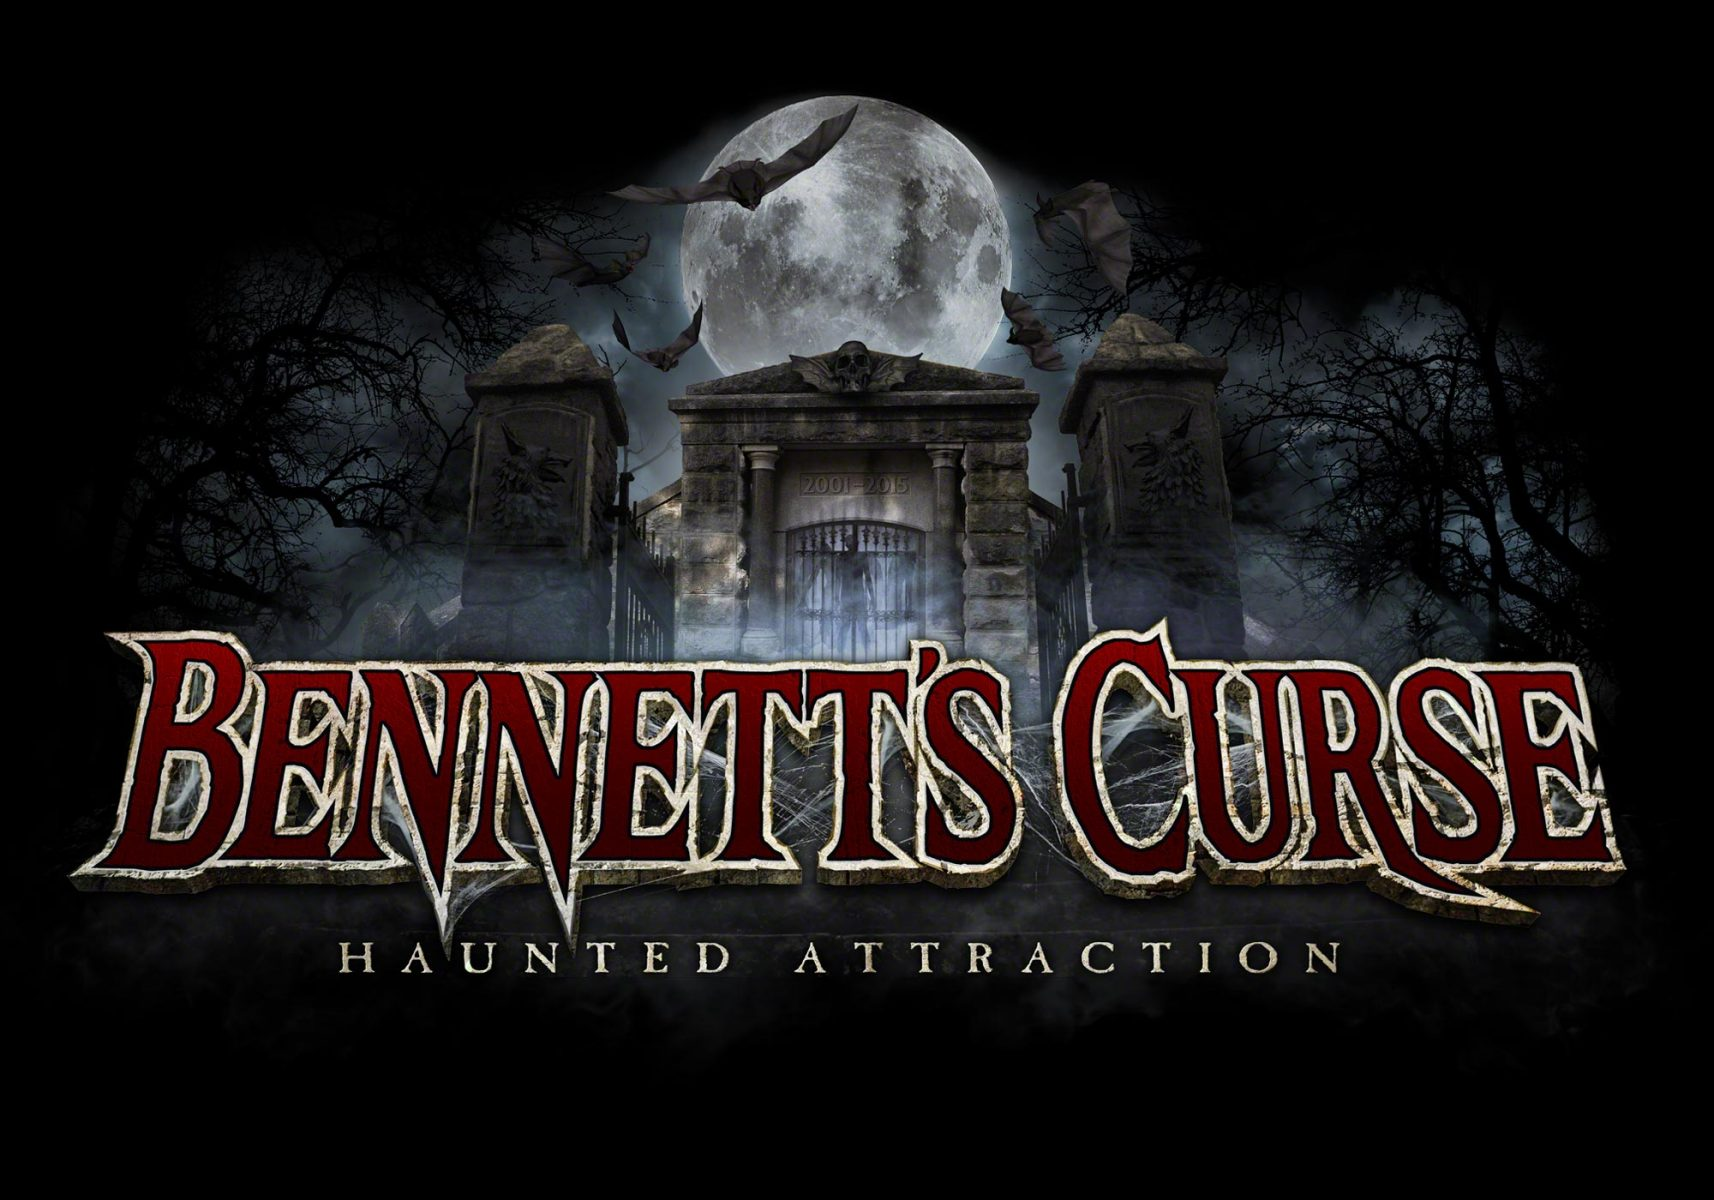 Bennetts-Curse-Logo